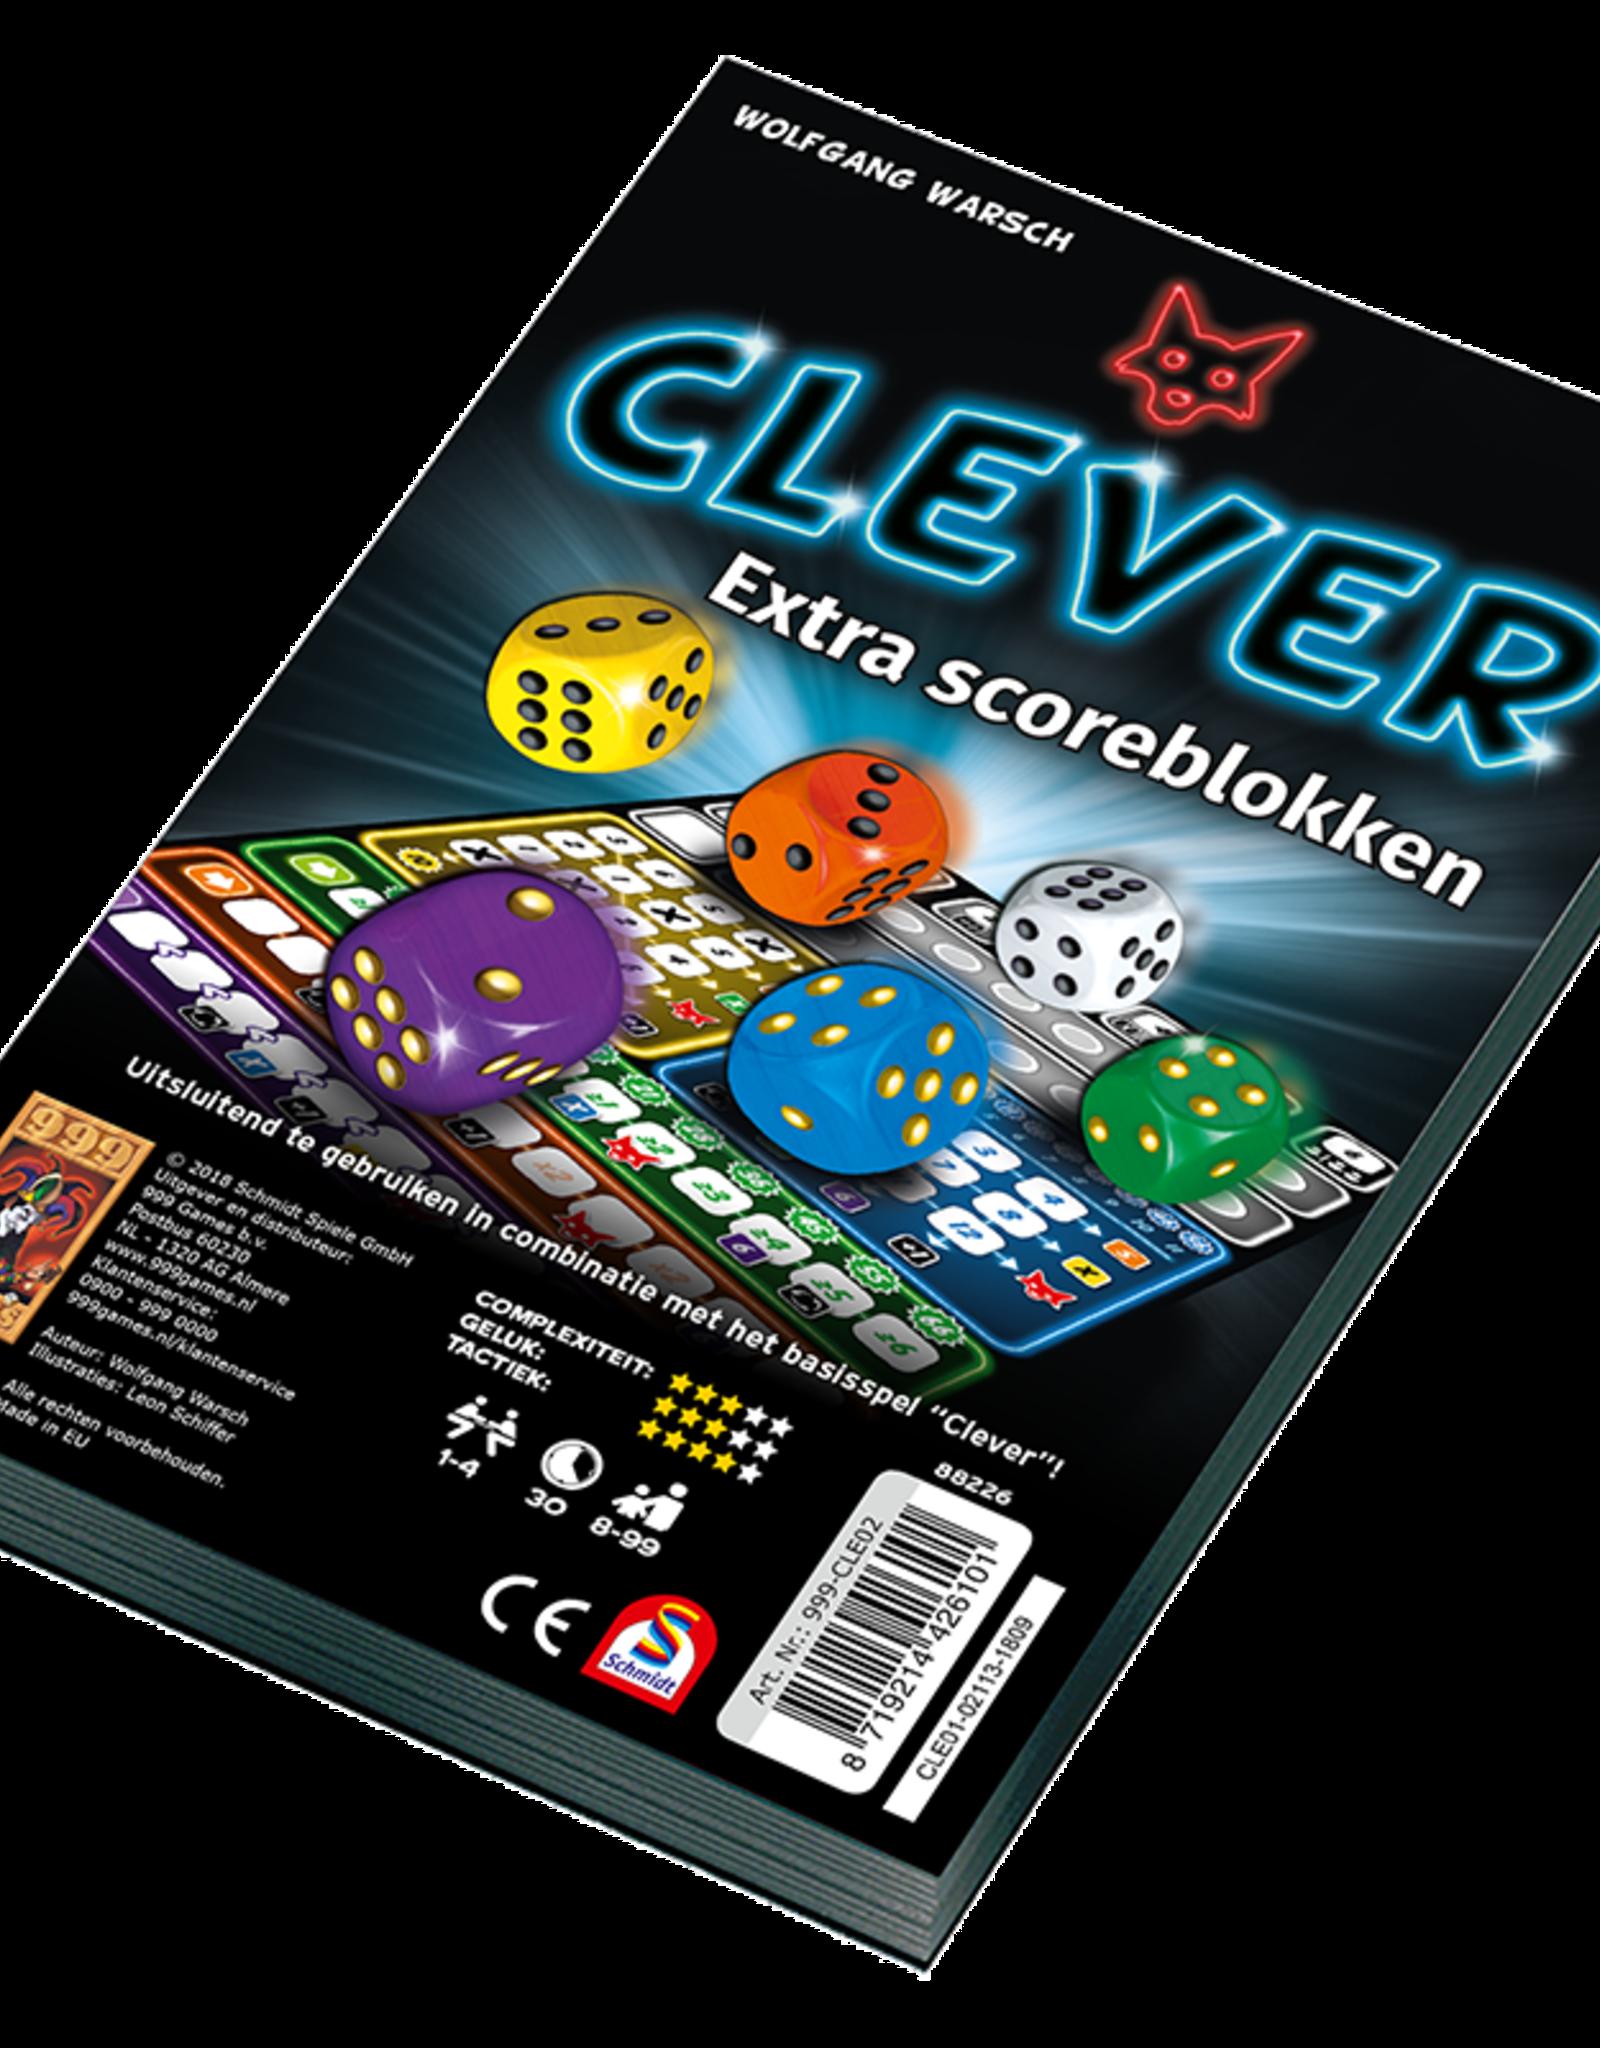 999-Games Clever: Scoreblok (NL)